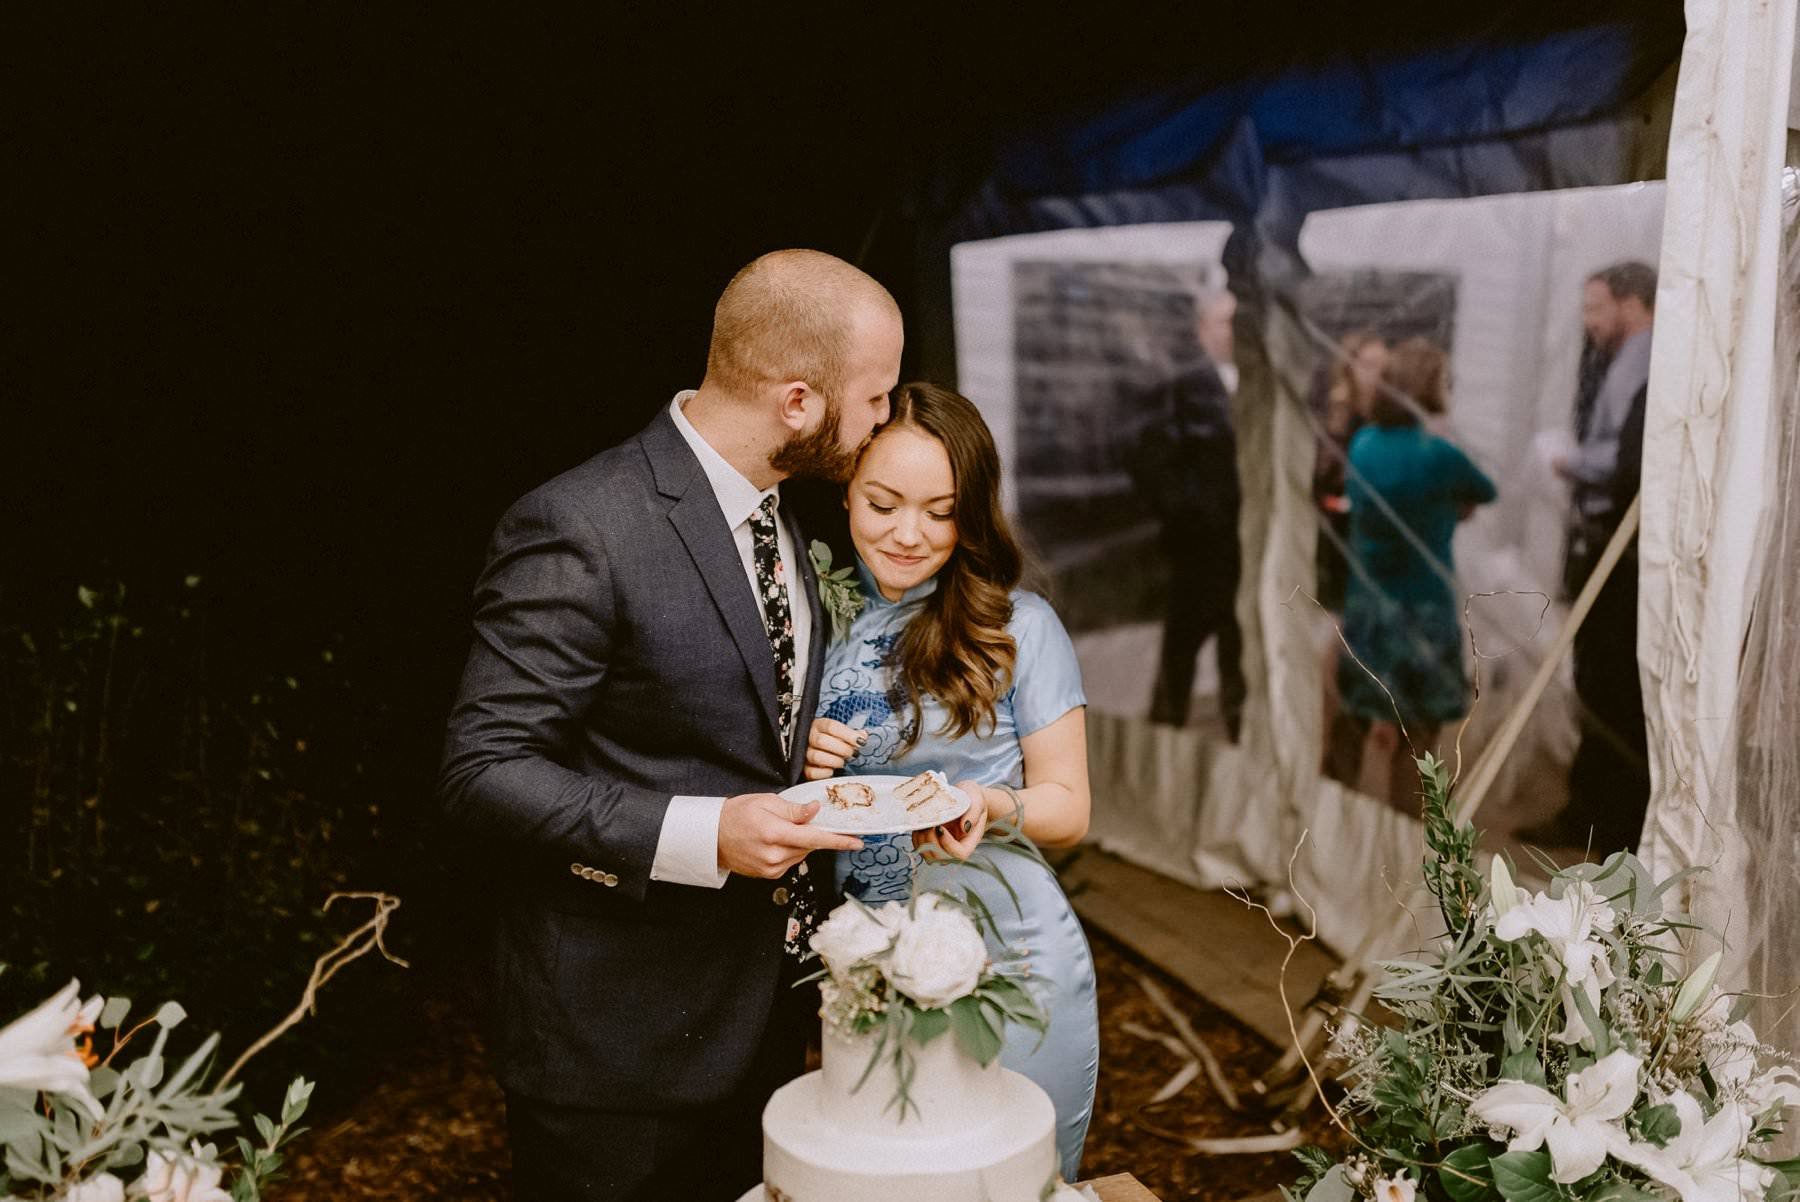 Tyler_arboretum_wedding-092.jpg